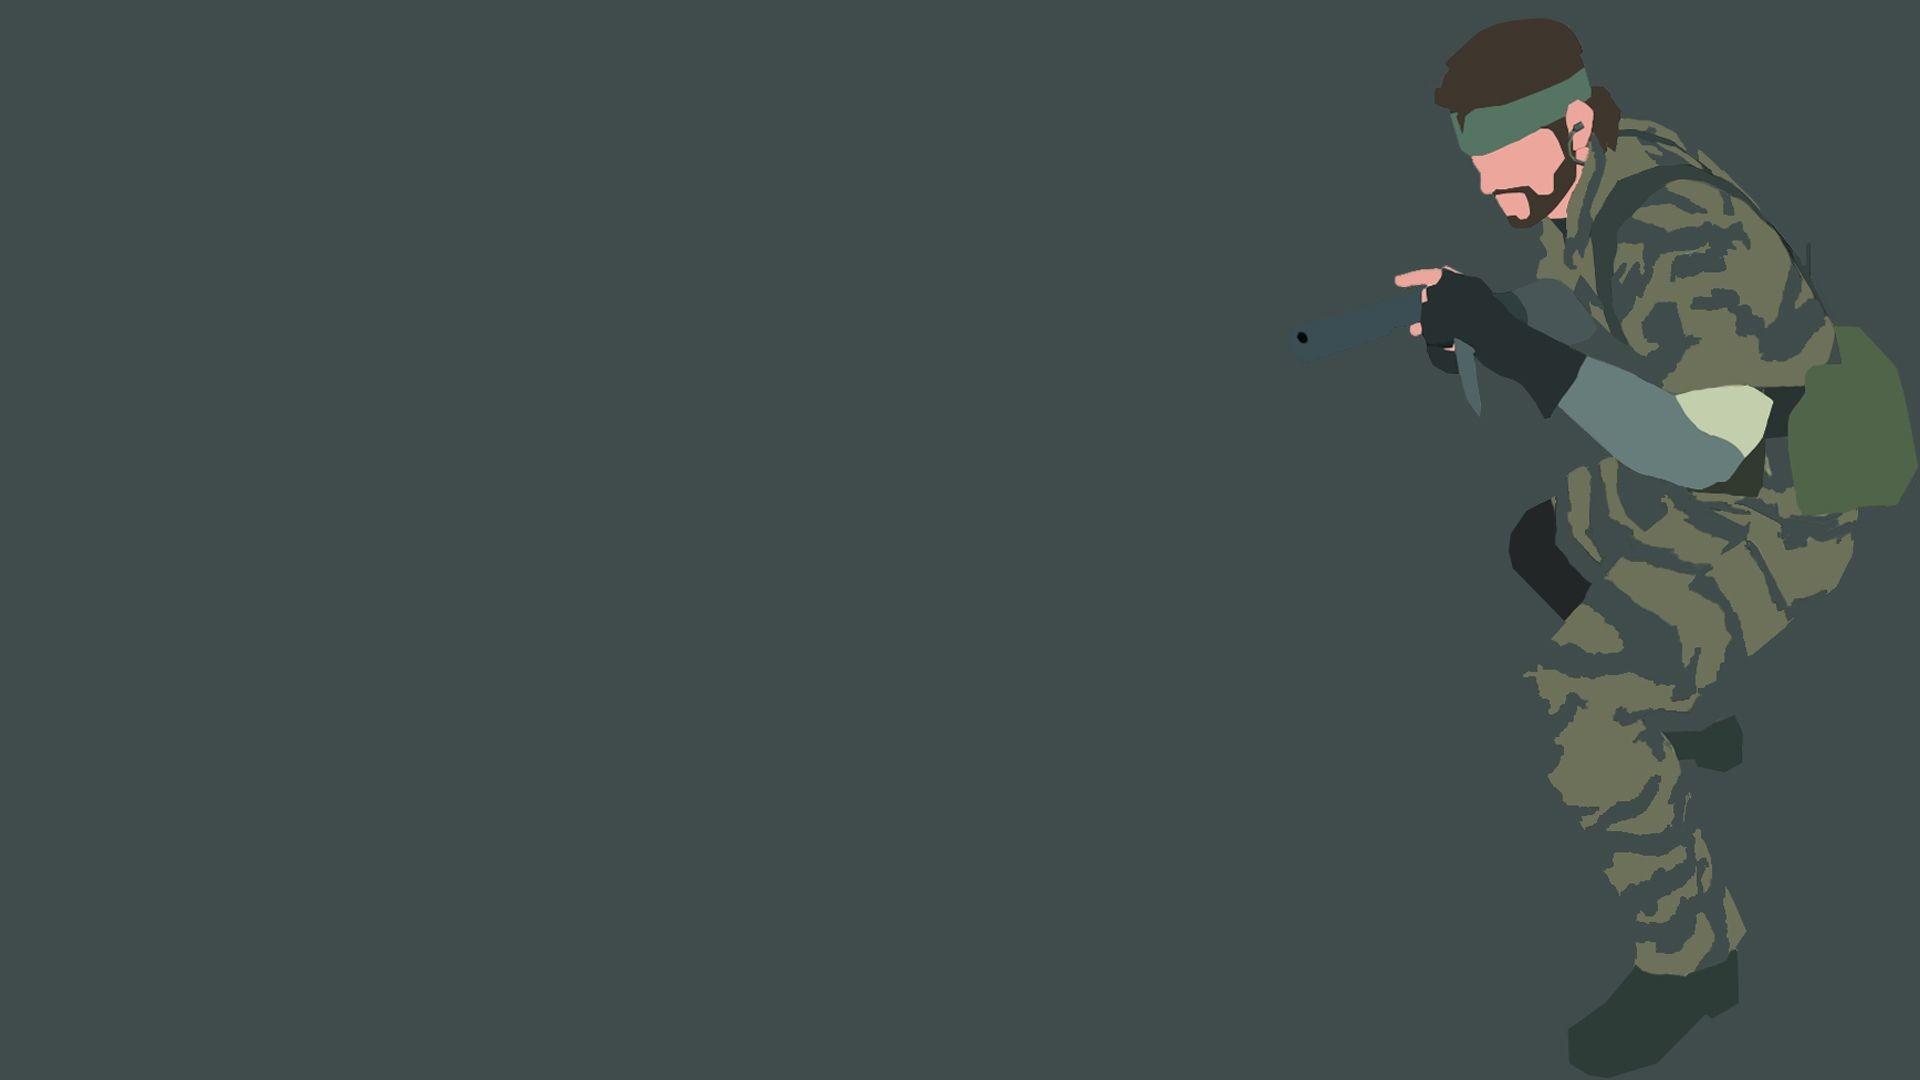 Res: 1920x1080, Metal Gear Solid HD Wallpaper |  | ID:27094